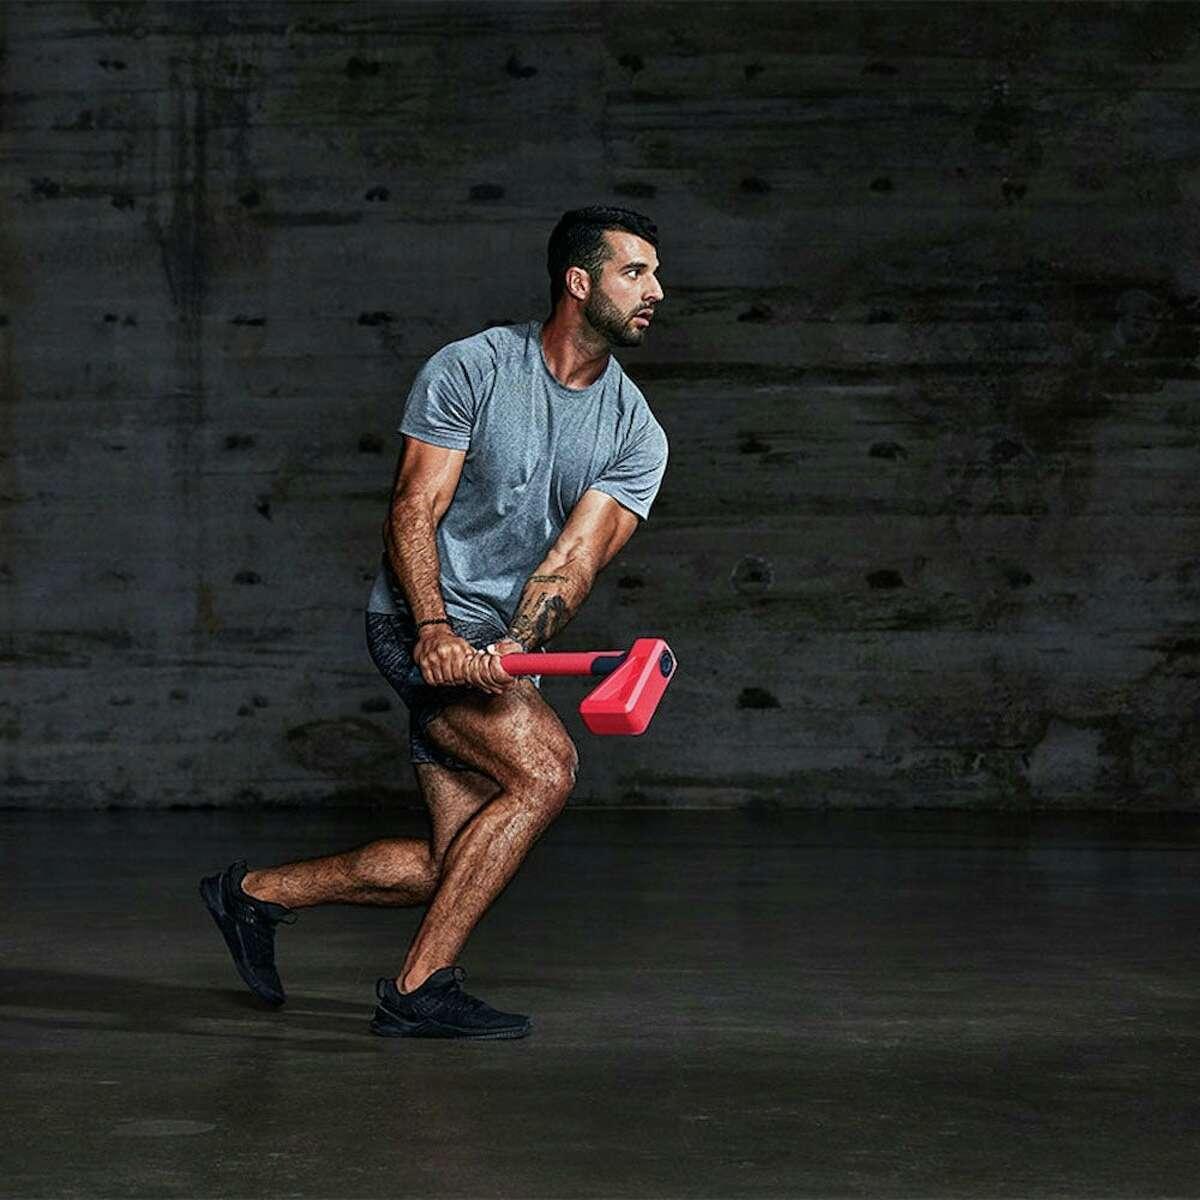 THE CHOPPER: Full-Body Workout